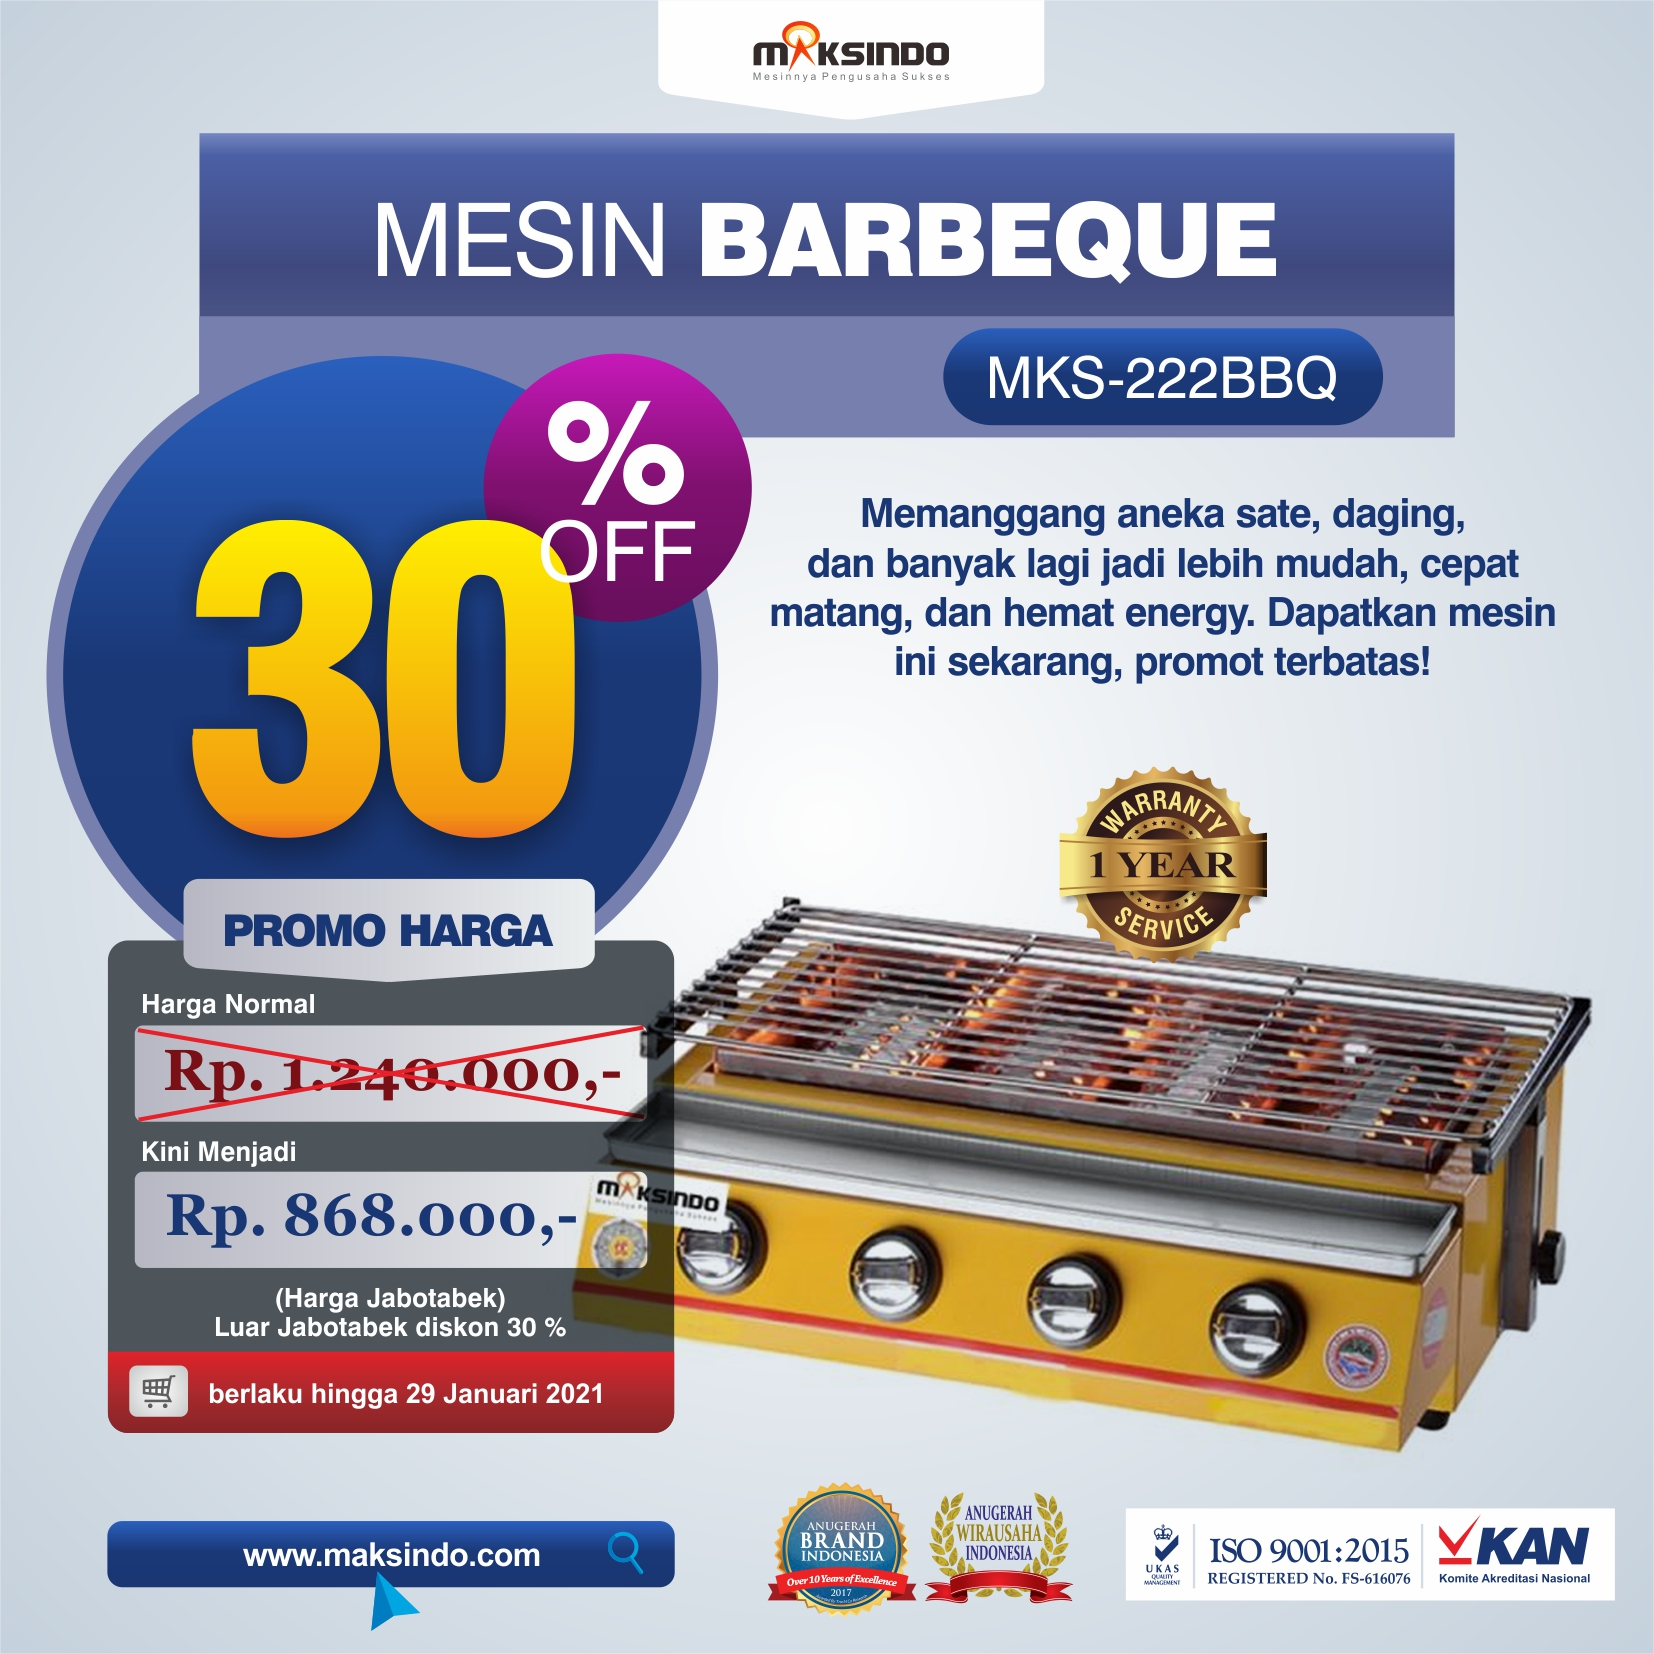 Jual Pemanggang BBQ Stainless (gas) 4 Tungku di Solo